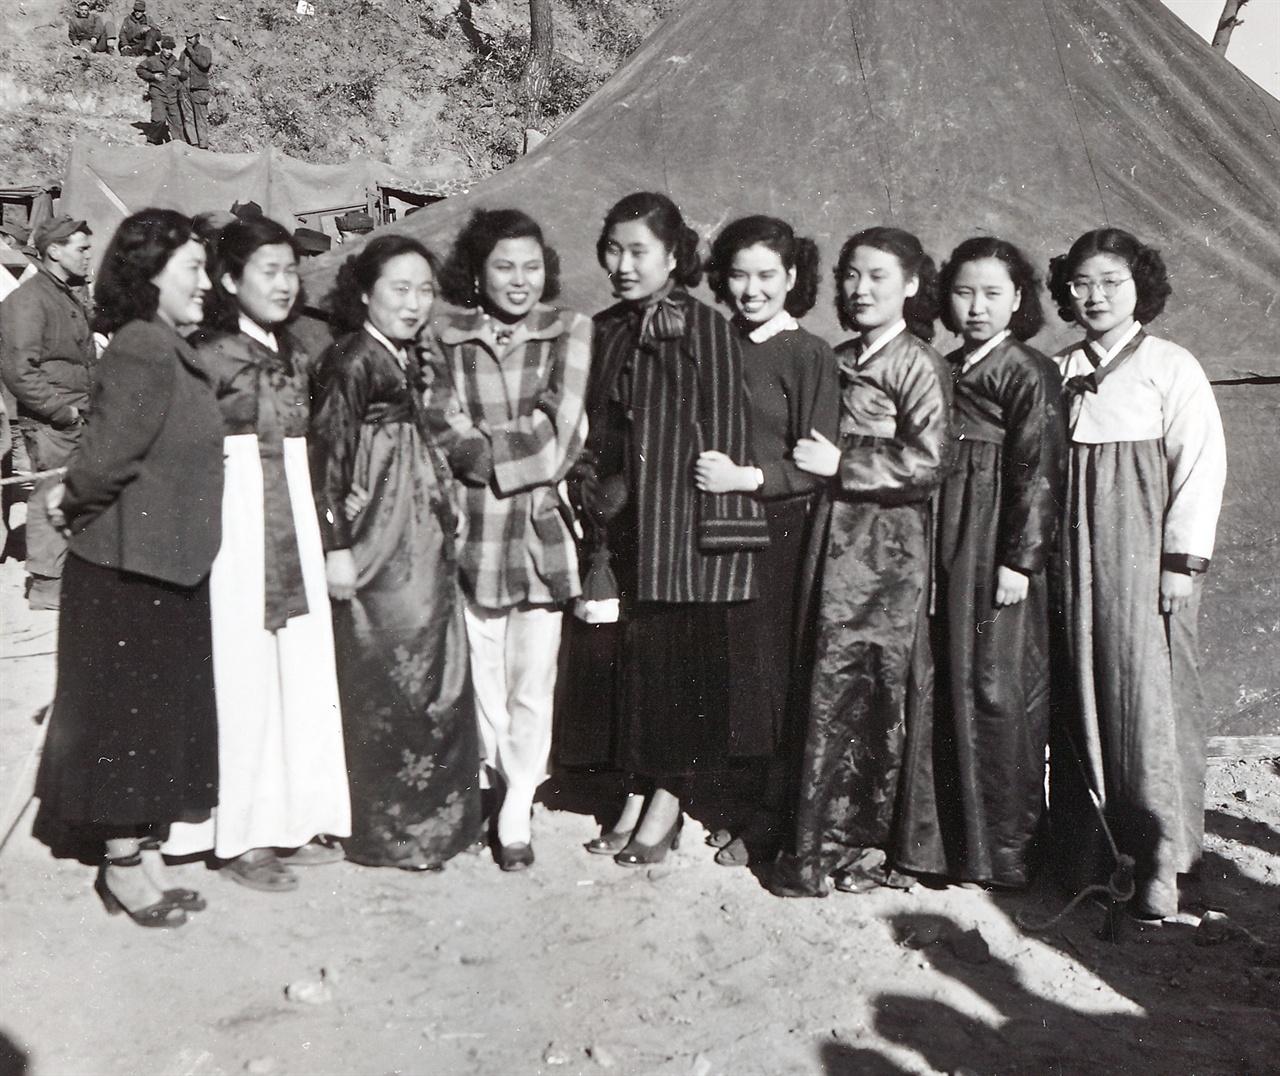 J. W. Helms, Jr. 하사가 찍은 사진 한국인 위문단(1950. 12. 27.).